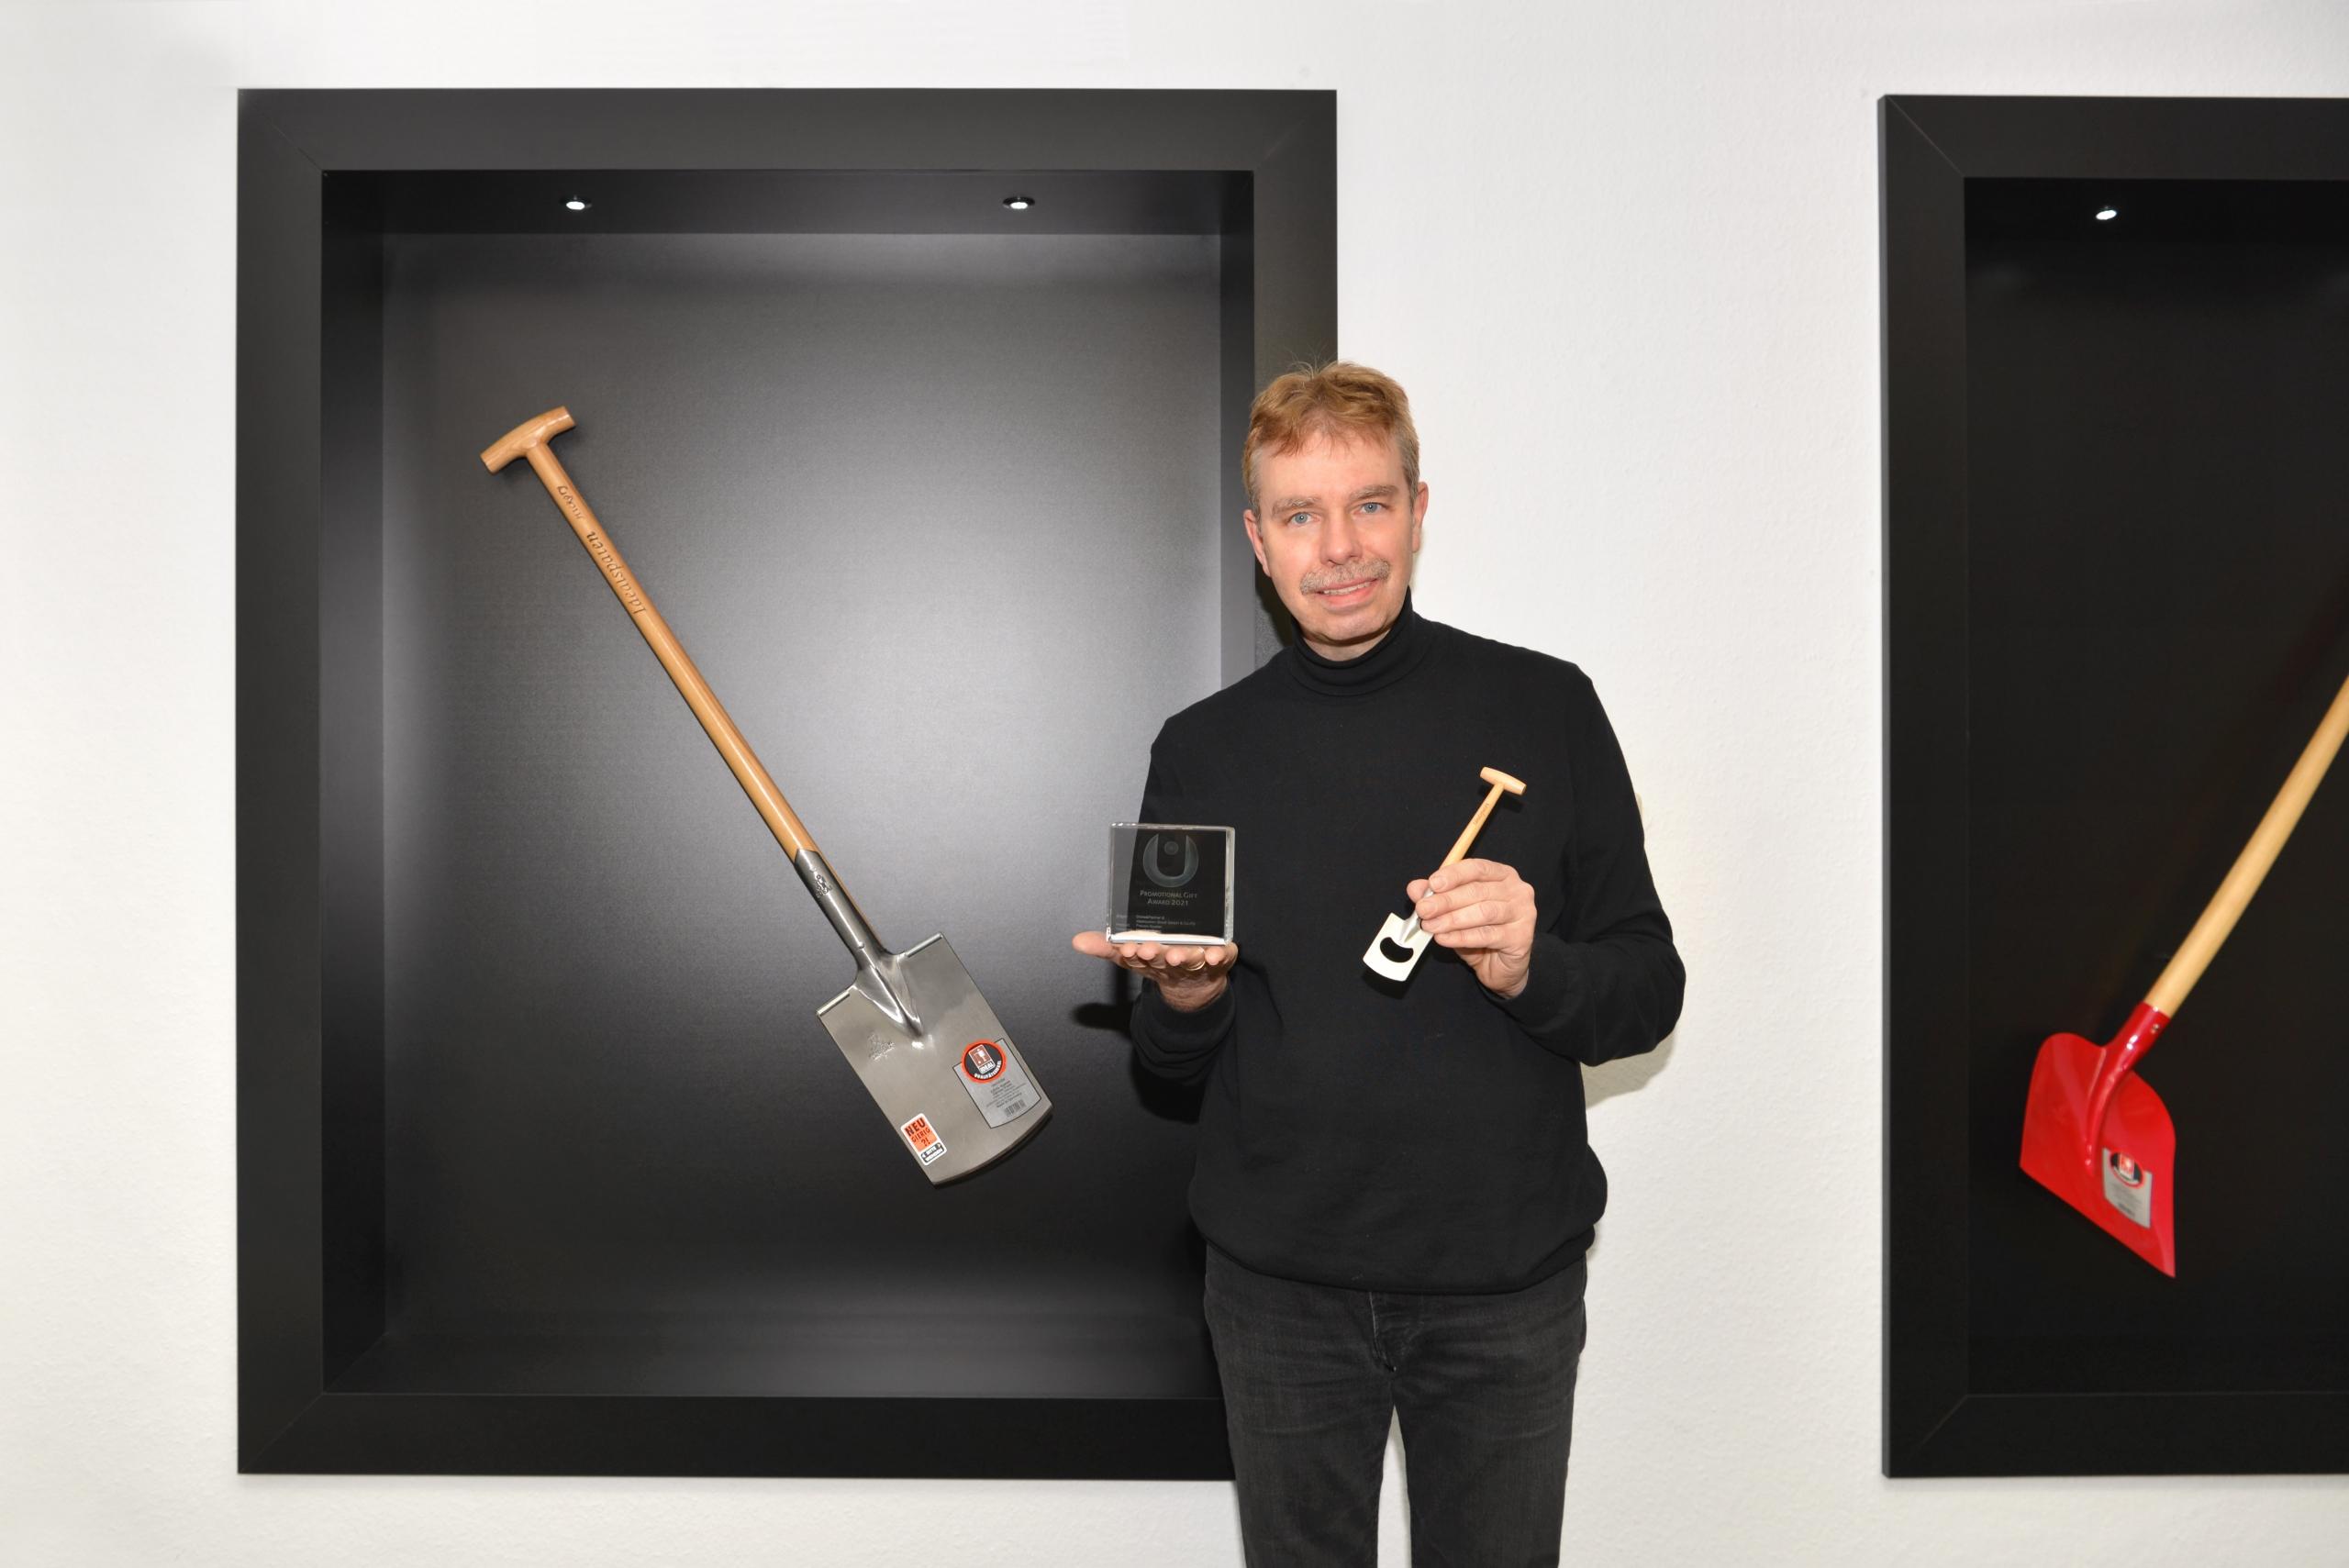 19 Freizeitspaten Promotional Gift Award 2021 01 scaled - Home